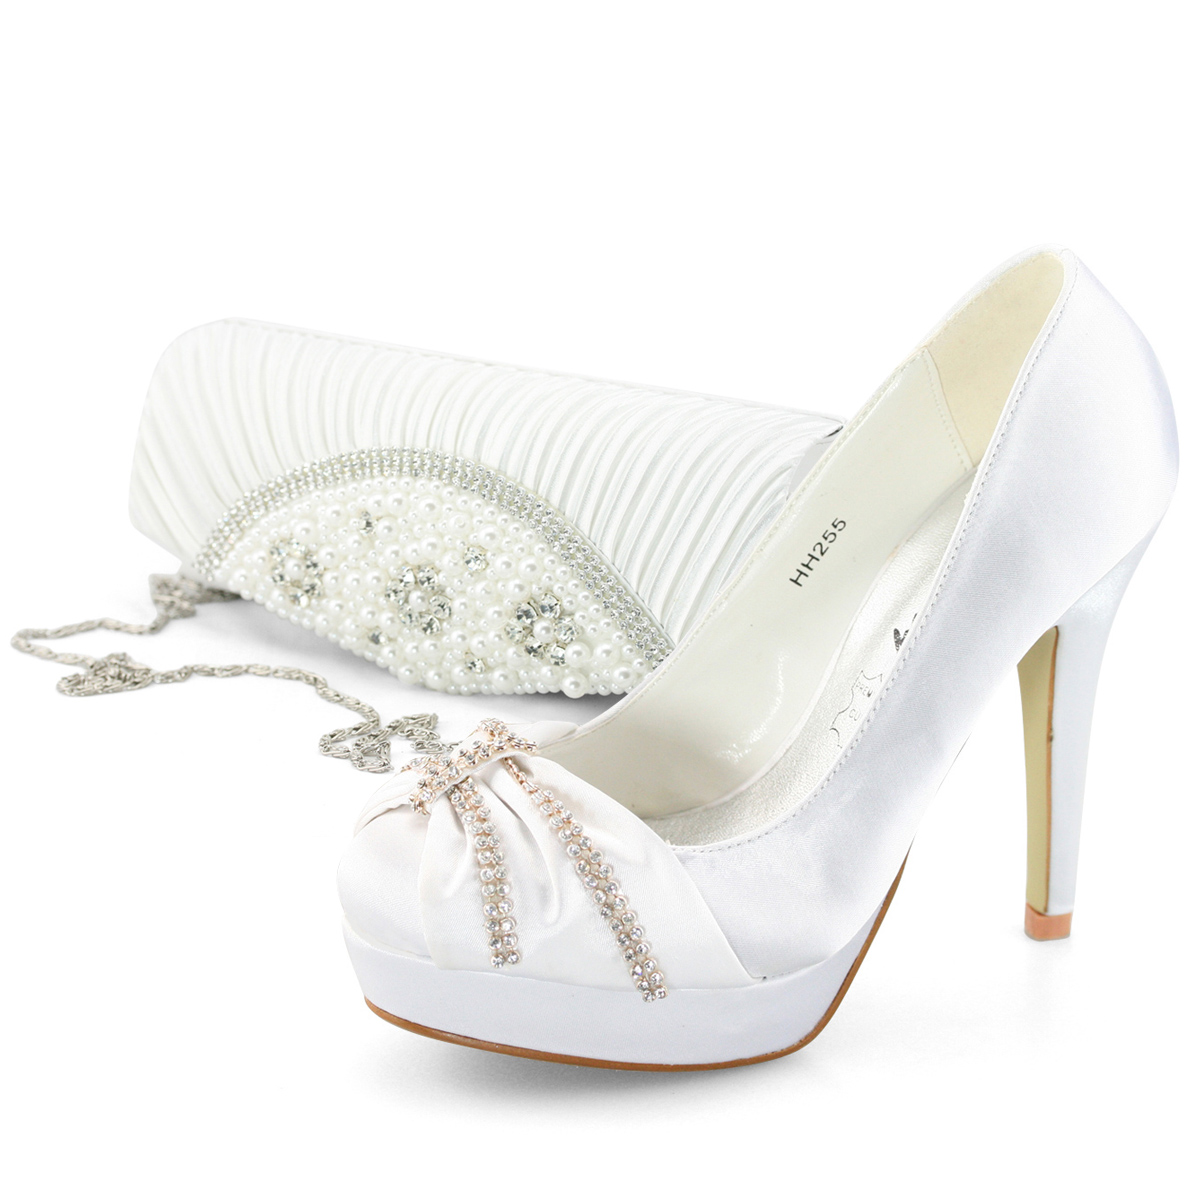 Beautiful White 5'' High Heel 1 2/5'' Platform Hollow Out